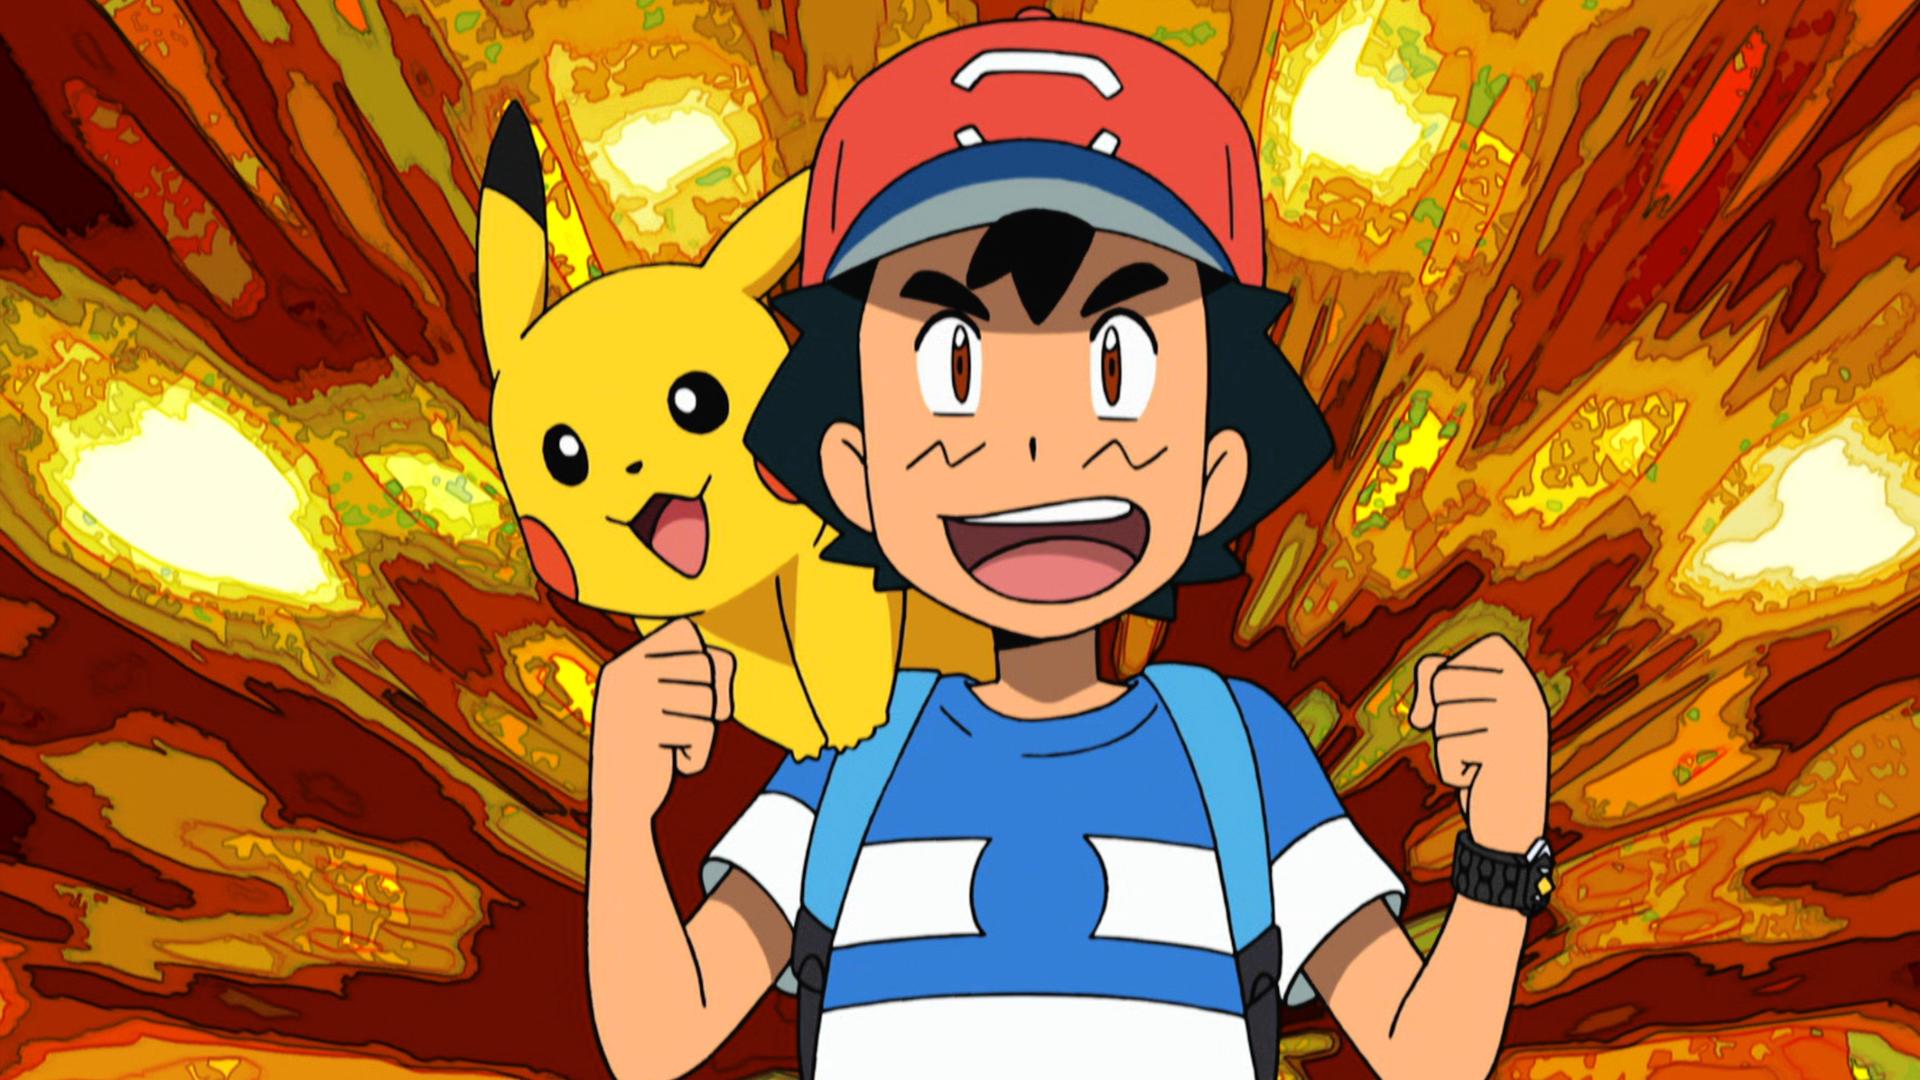 Pokémon Sol e Lua